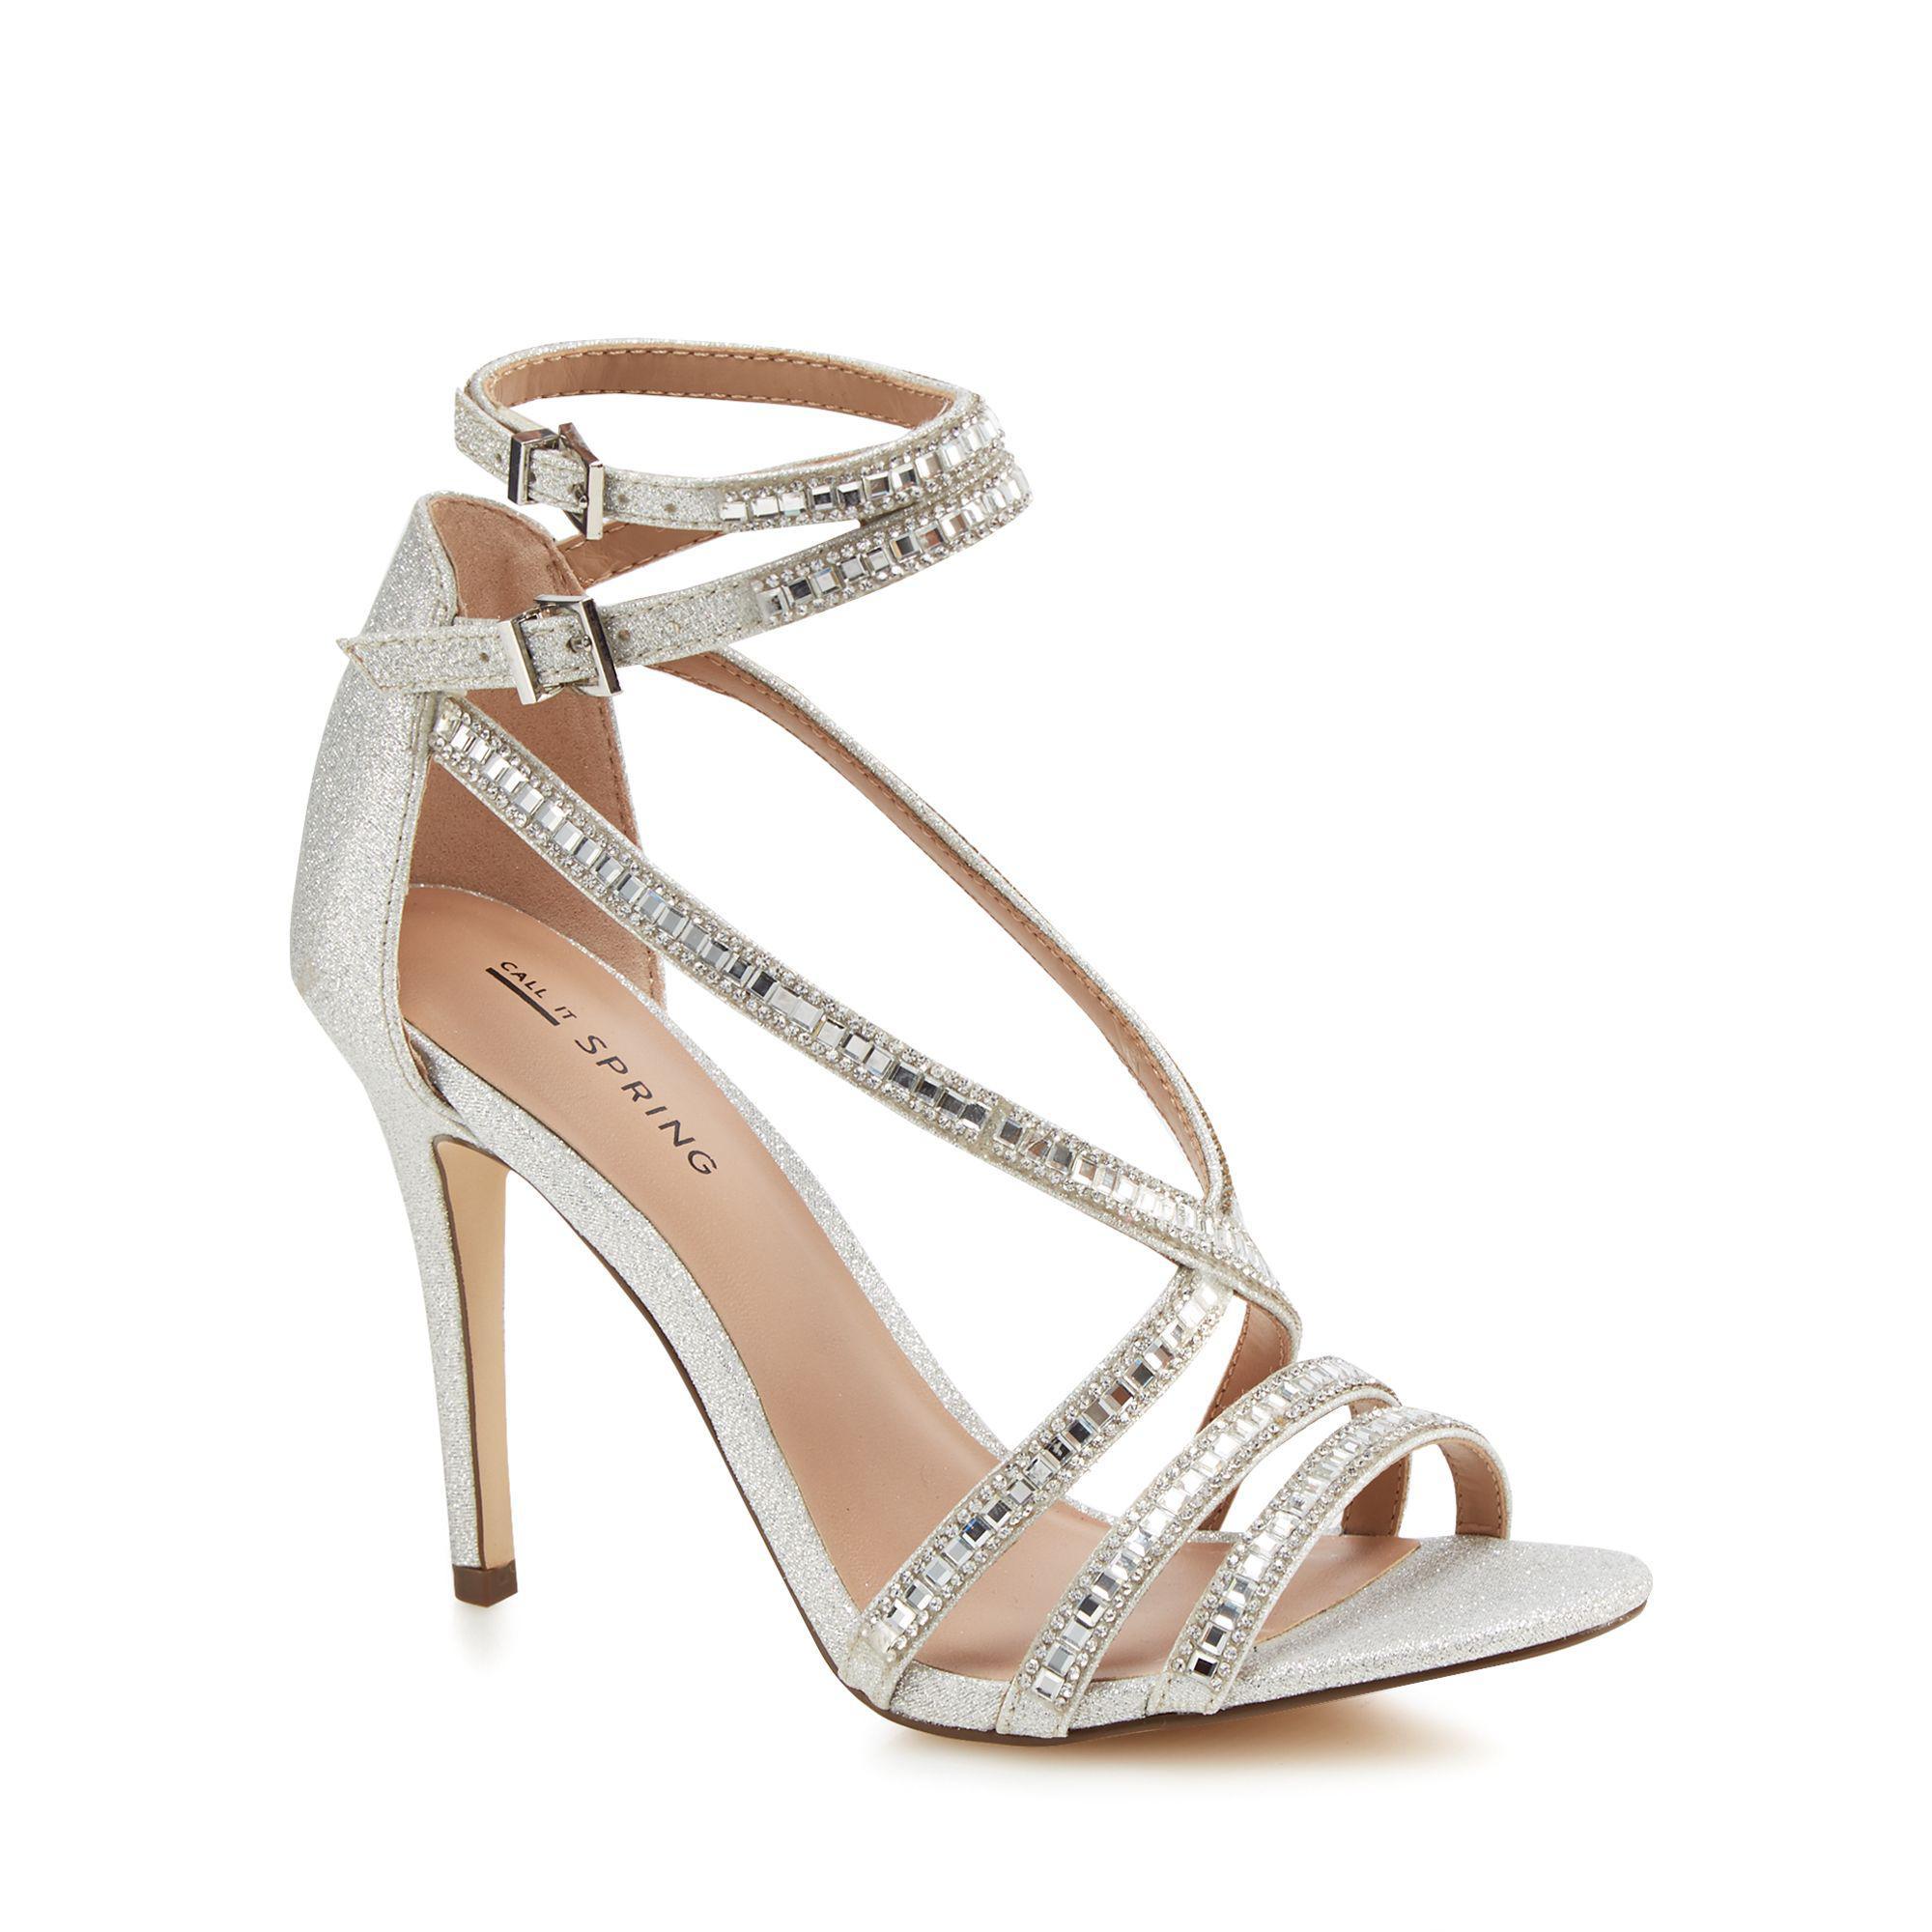 8aa83d2284e Call It Spring. Women s Metallic Silver Glitter  gaffigan  High Stiletto  Heel Ankle Strap Sandals